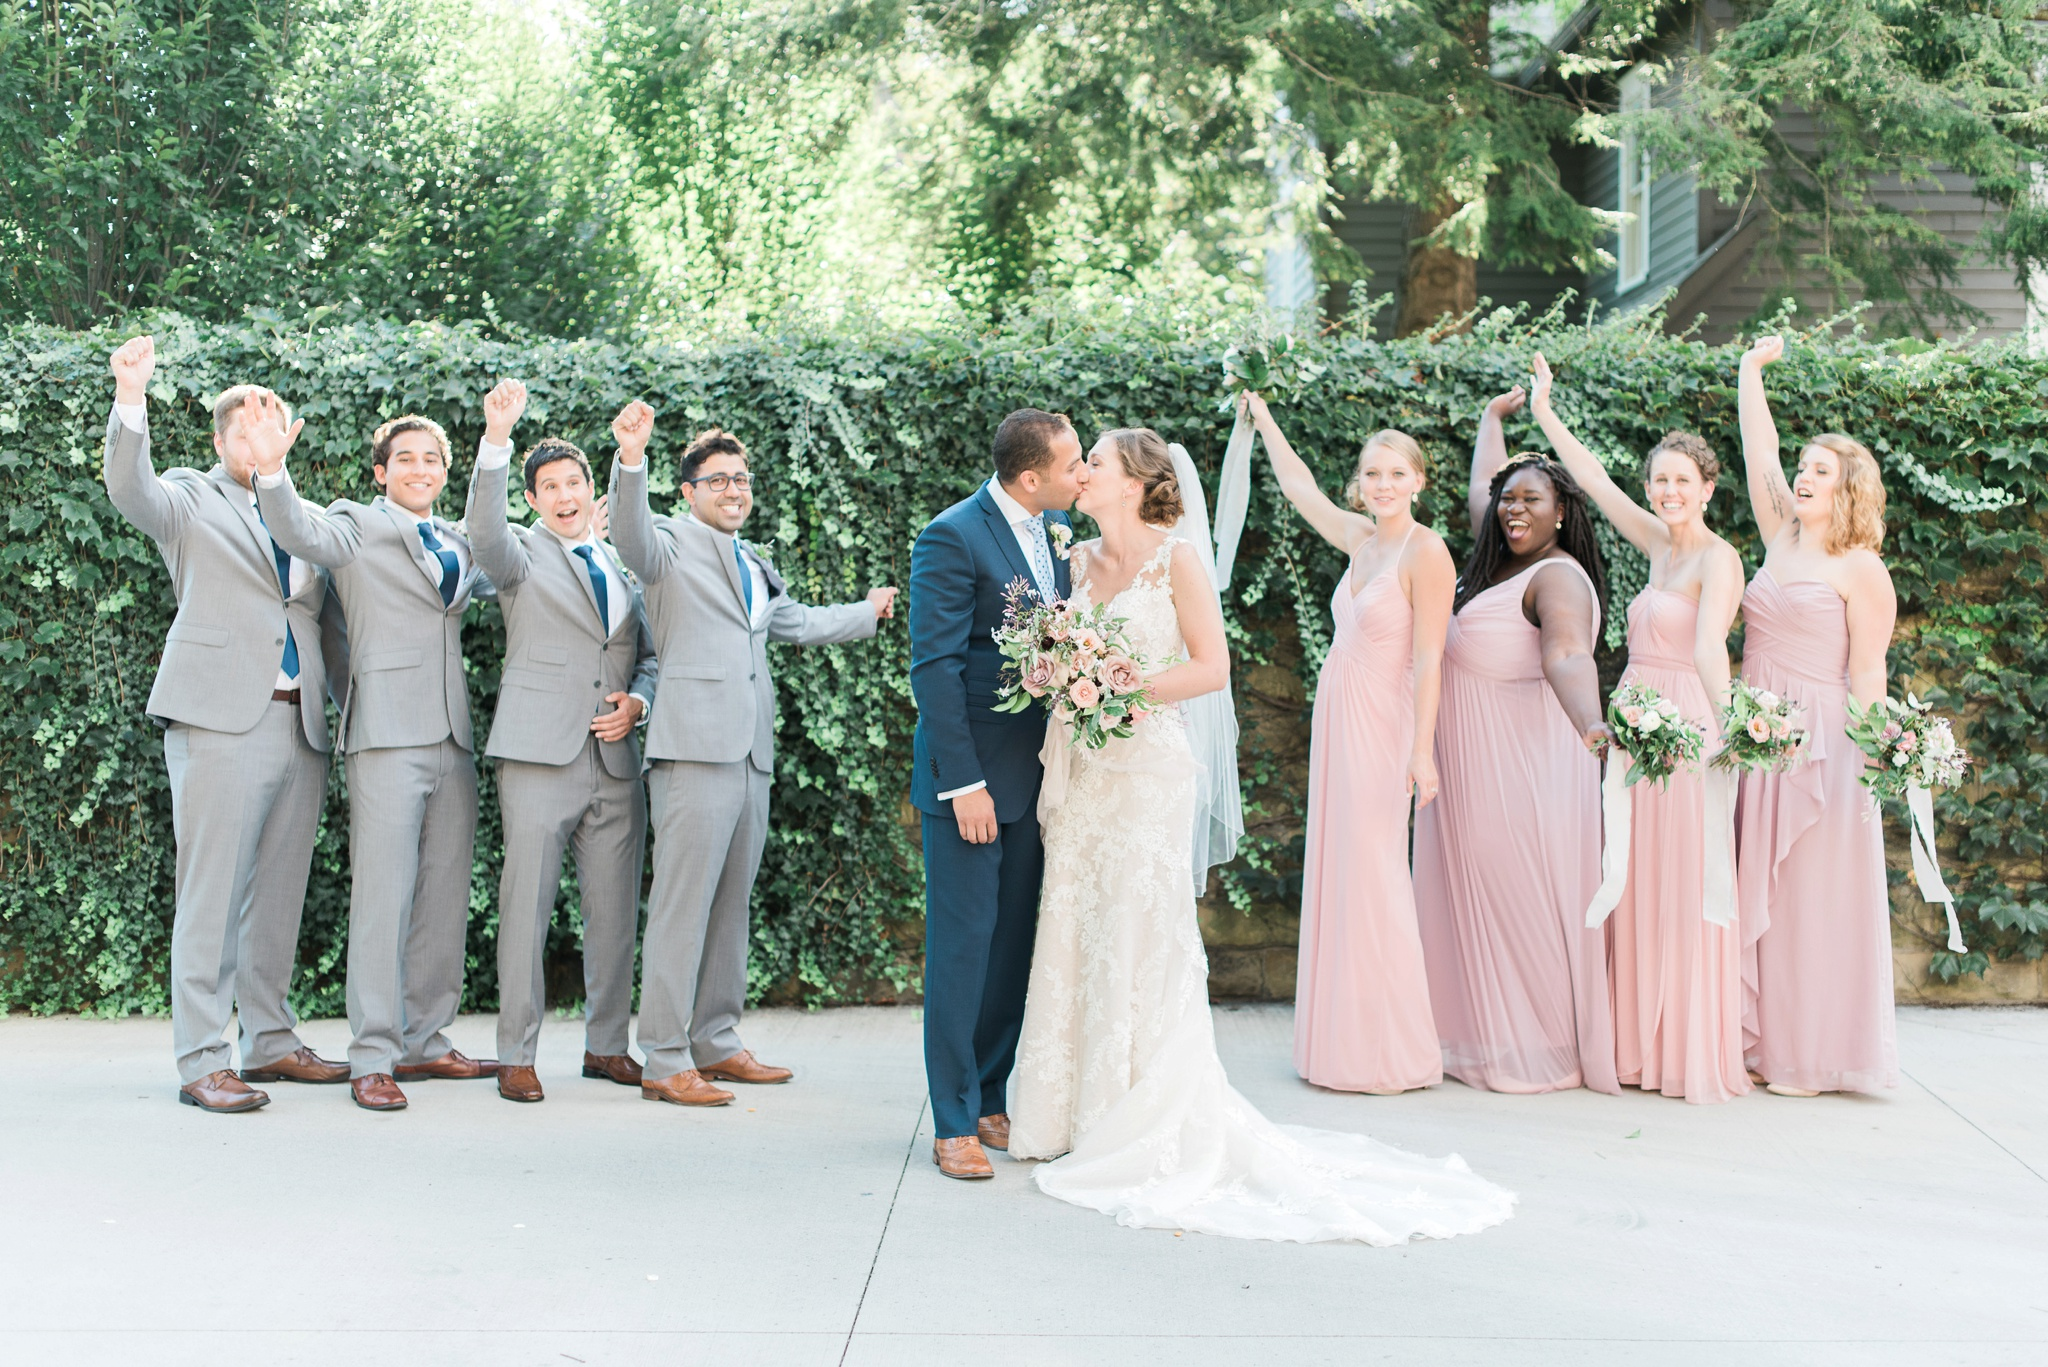 granville-inn-wedding-columbus-ohio-photographer_0046.jpg